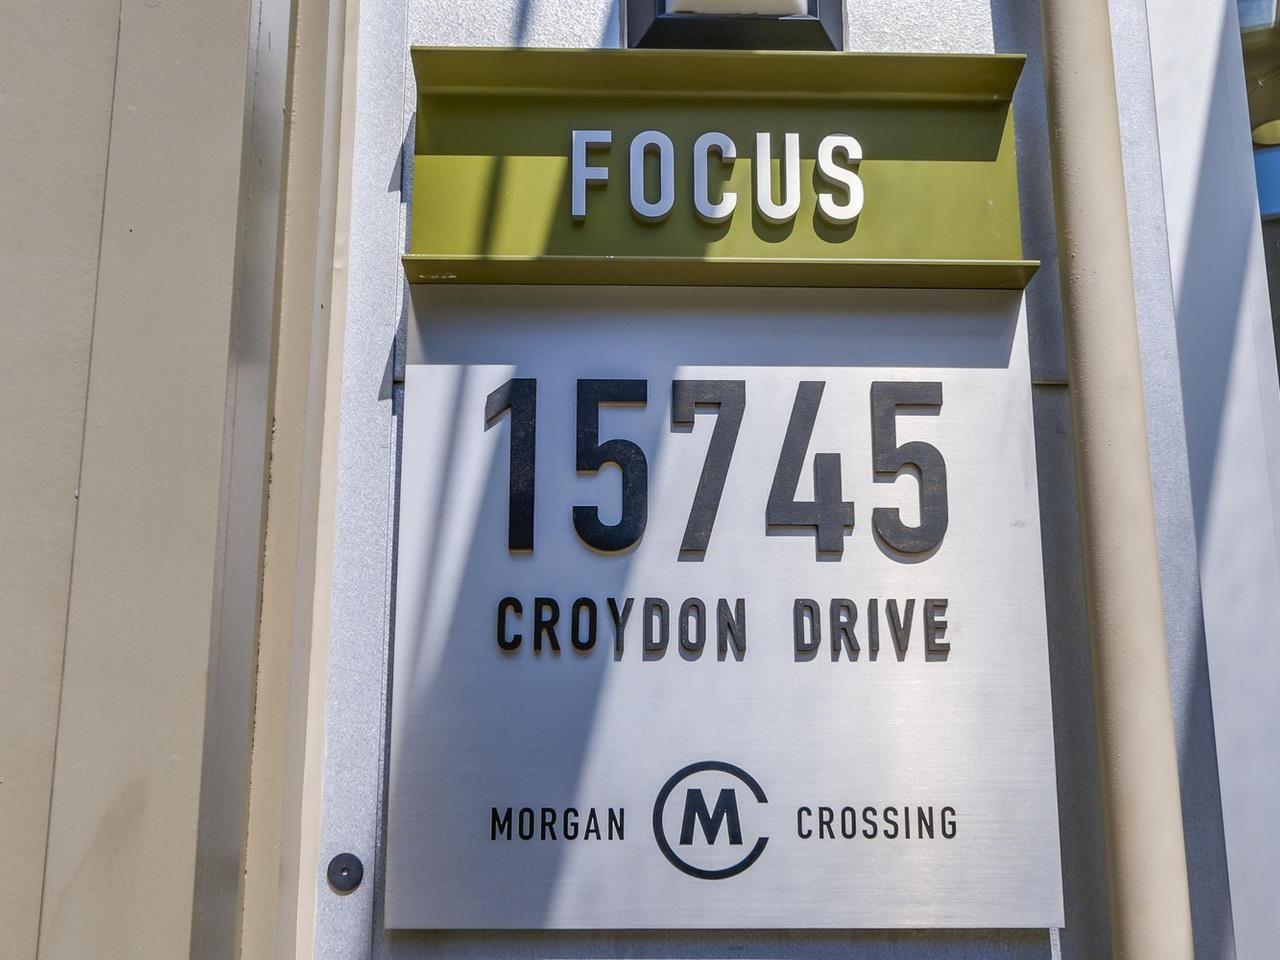 "Main Photo: 201 15745 CROYDON Drive in Surrey: Grandview Surrey Condo for sale in ""The Residences at Morgan Crossing"" (South Surrey White Rock)  : MLS®# R2099074"